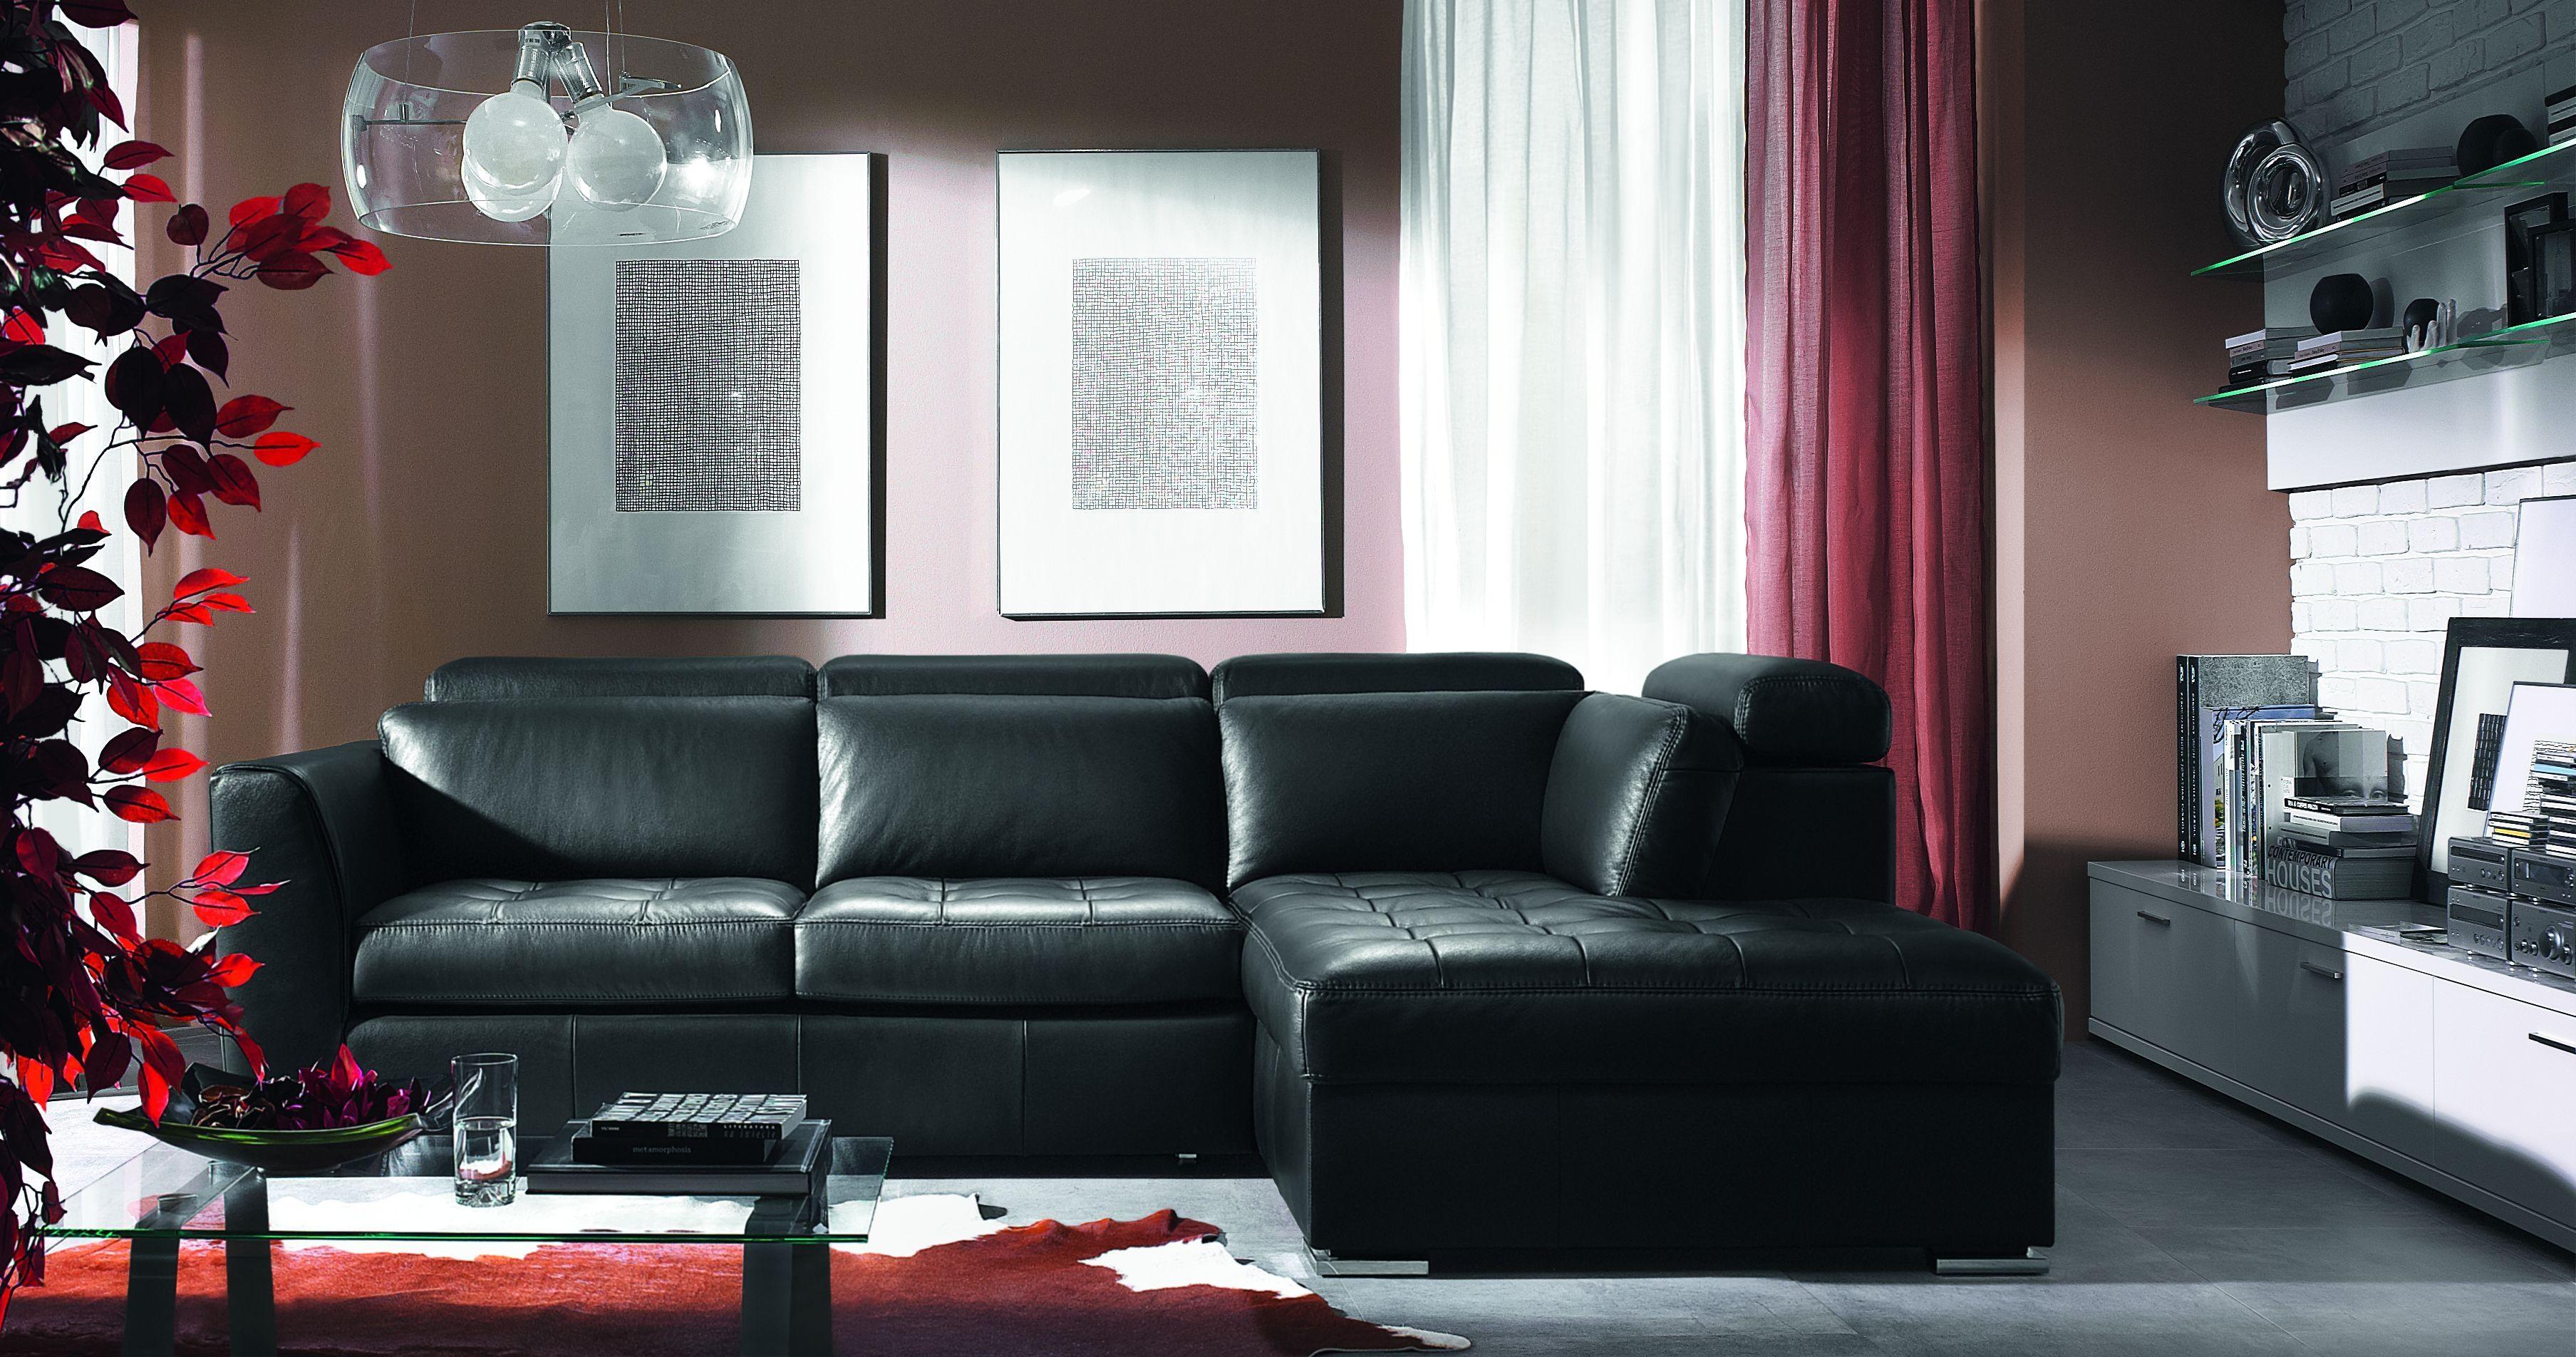 Black Sofa Decor | Sofa Gallery | Kengire With Regard To Black Sofas Decors (View 4 of 20)